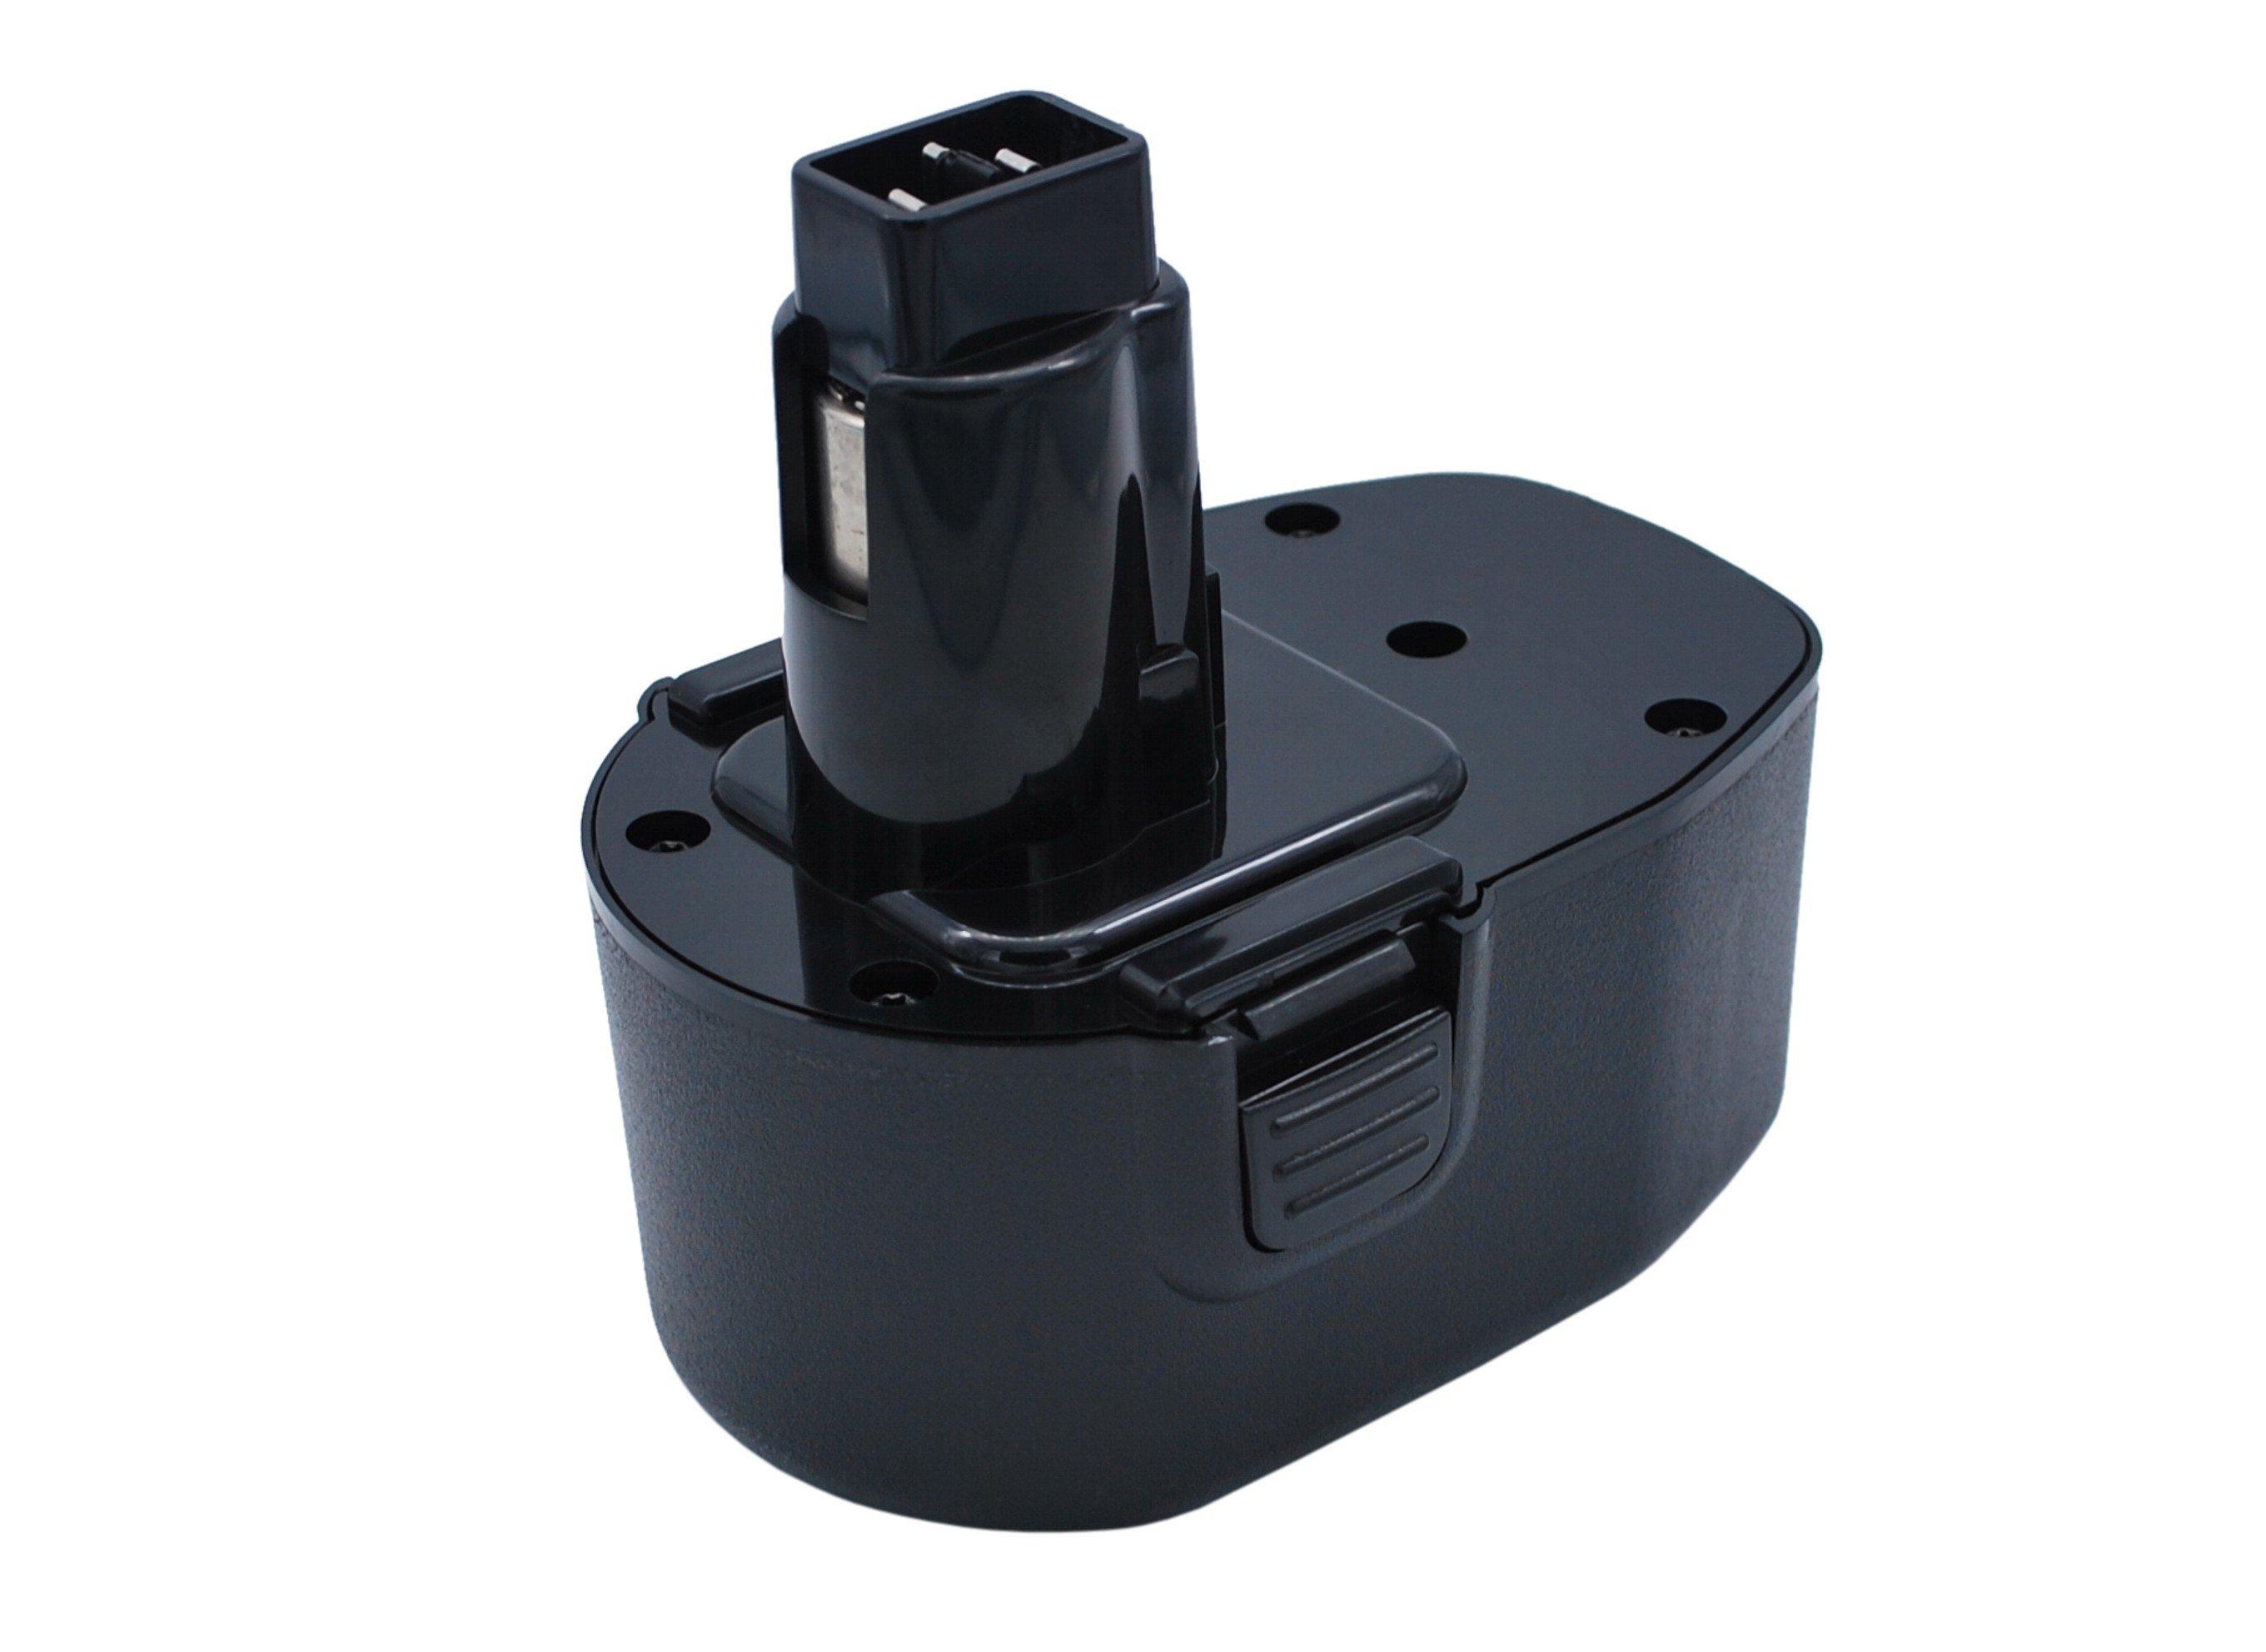 Аккумулятор для Black & Decker A9262, A9267, A9276, PS140 2000mah CameronSino